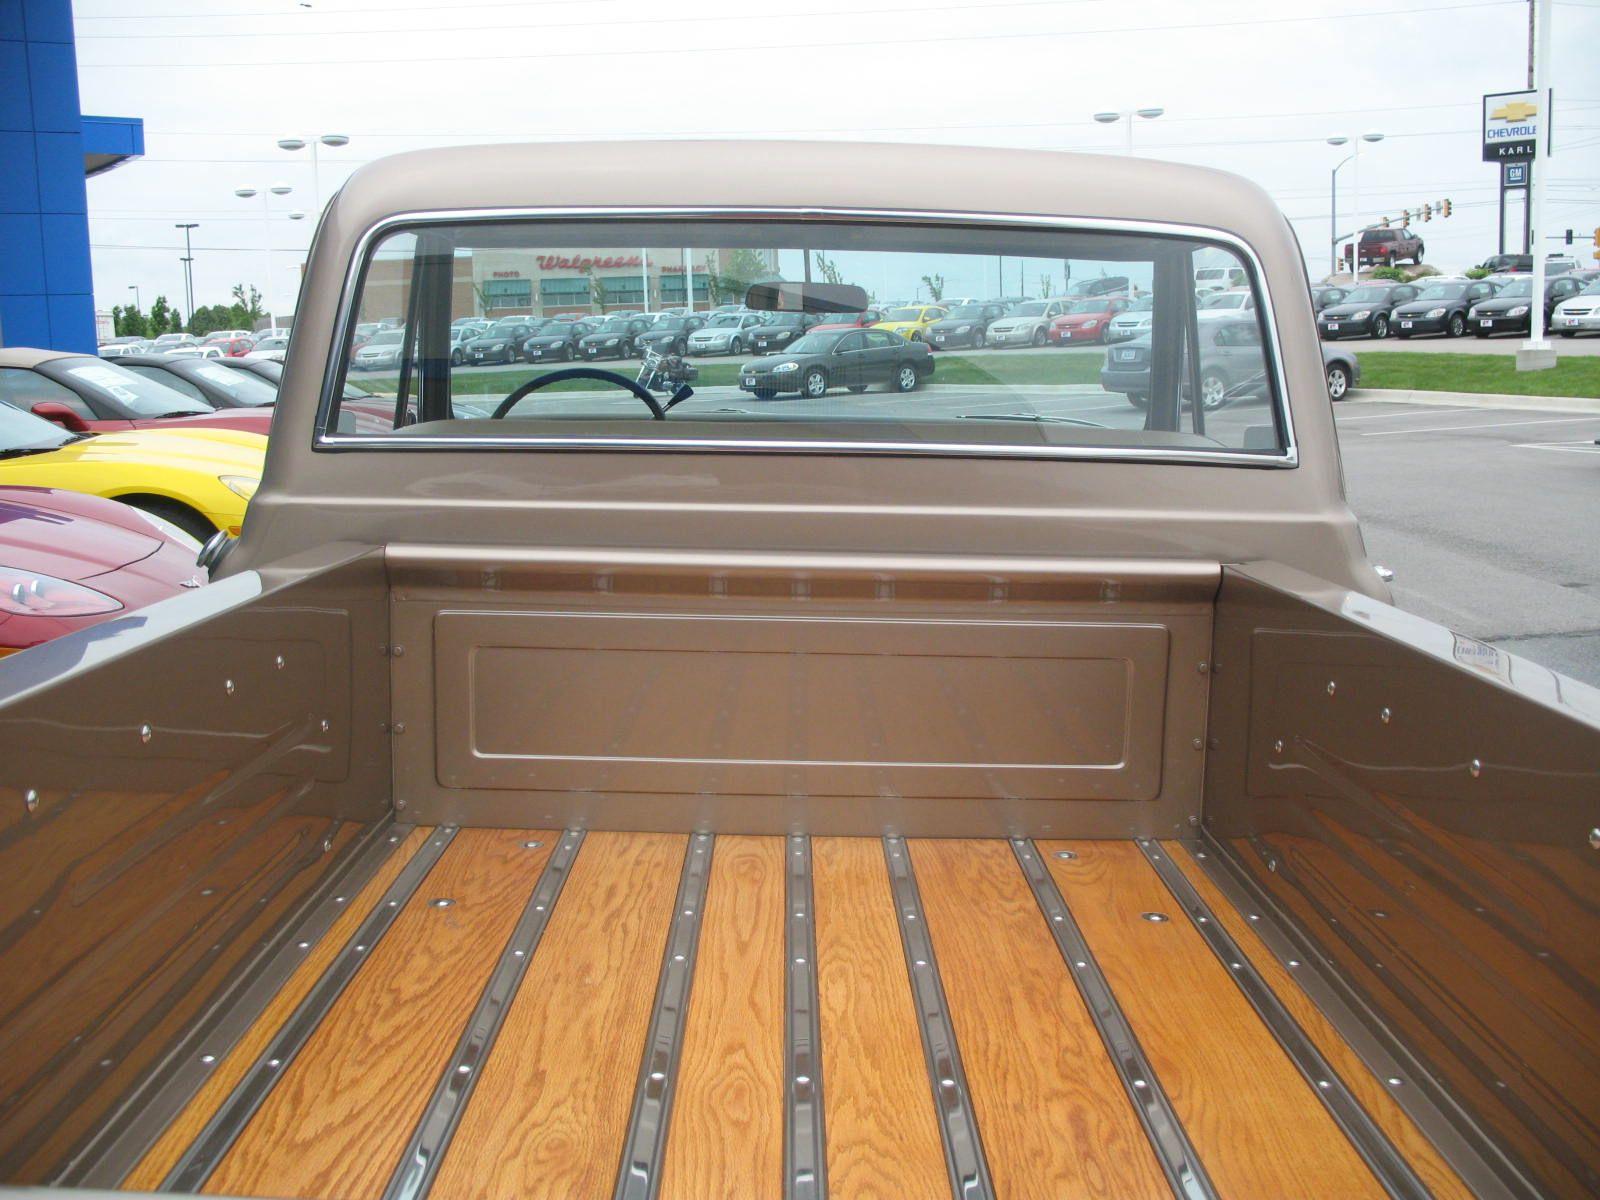 1970 Silverado New chevy, Used car dealer, Car